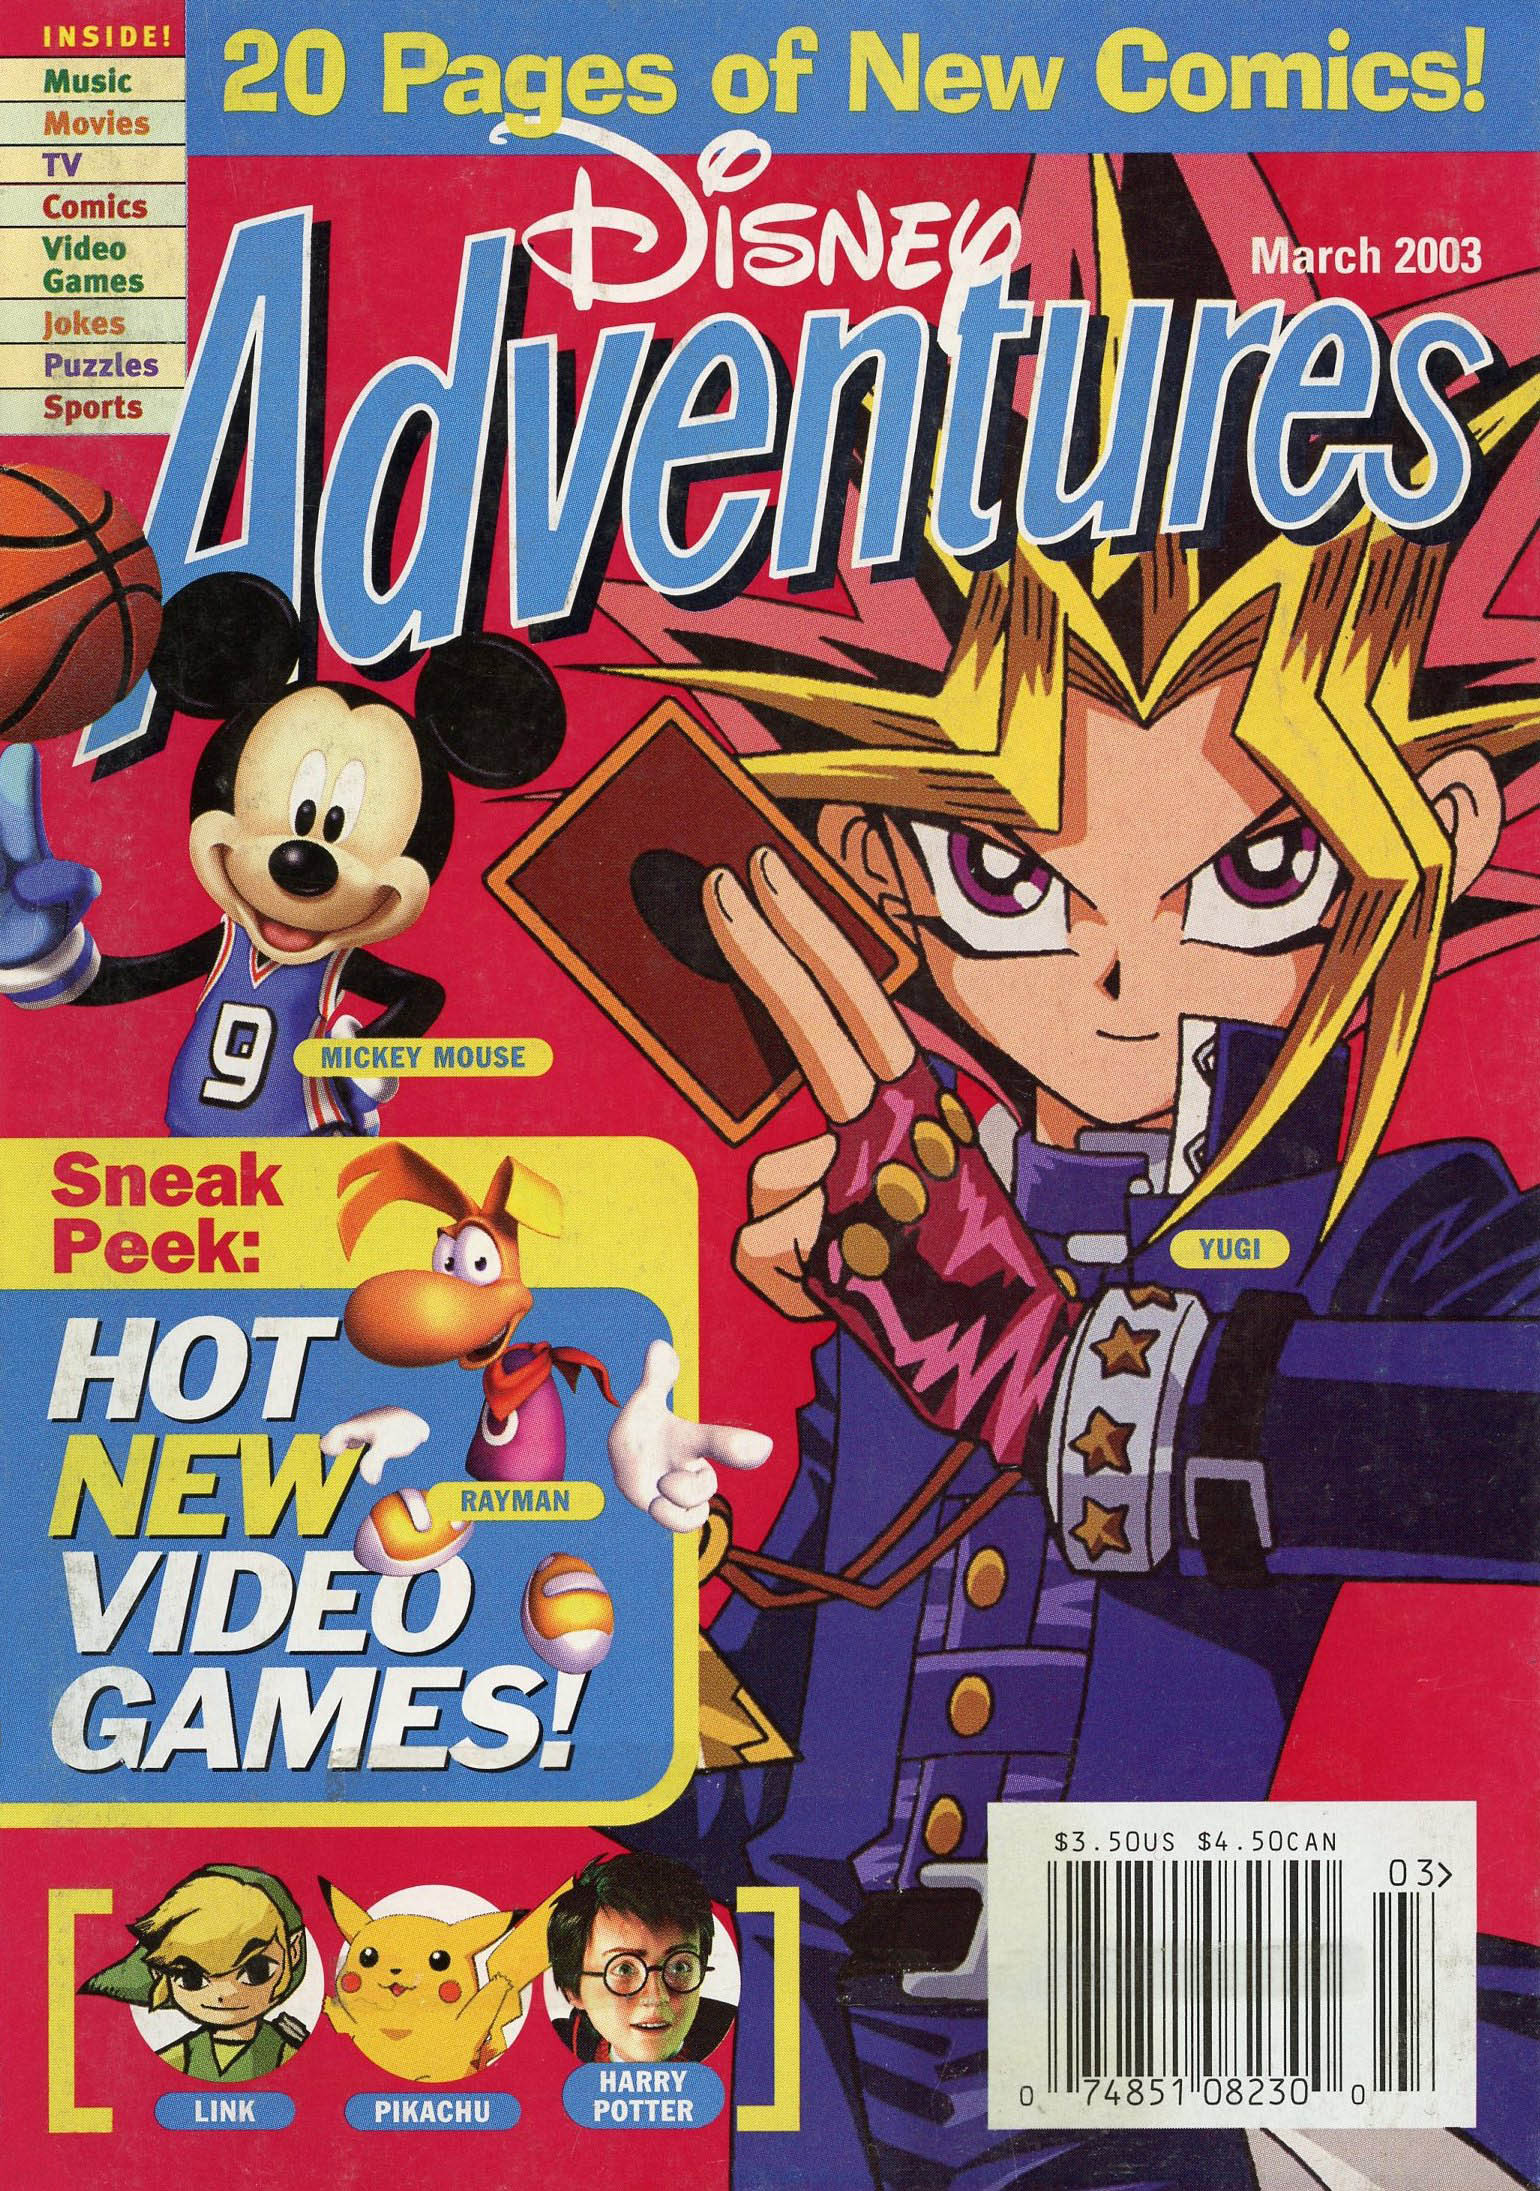 Image - Disney Adventures Magazine cover March 2003 Yu gi oh.jpg  Disney Wiki  FANDOM powered